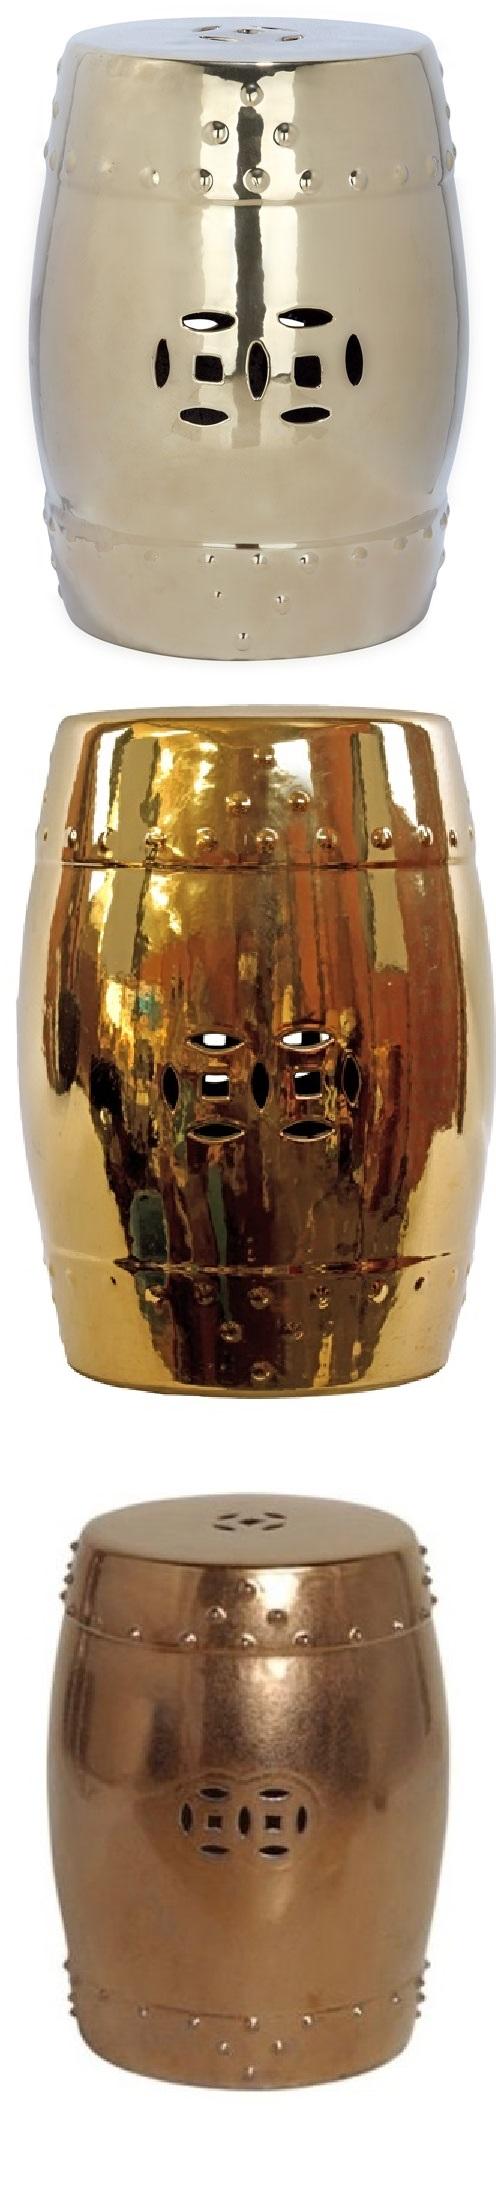 Gold Garden Stool | Gold Ceramic Stools | Gold Porcelain Stool ...